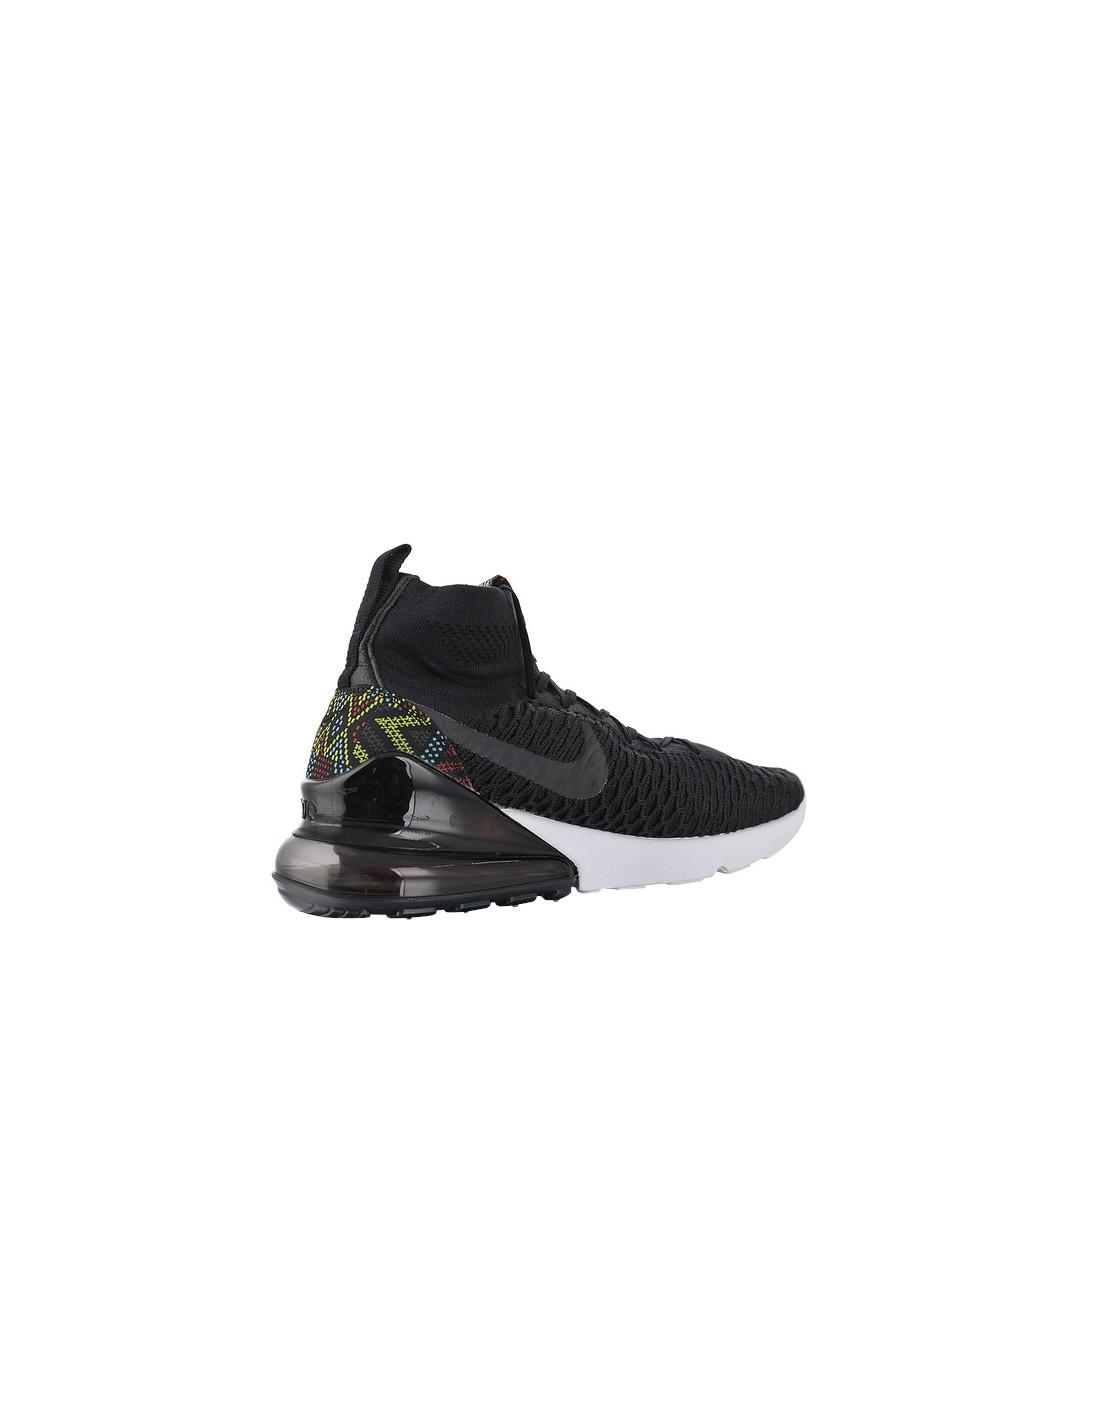 e88efbe20d0d9 Home · Air Max 270 Footscape Magista Flyknit. Previous. Next. Previous.  Next. Nike